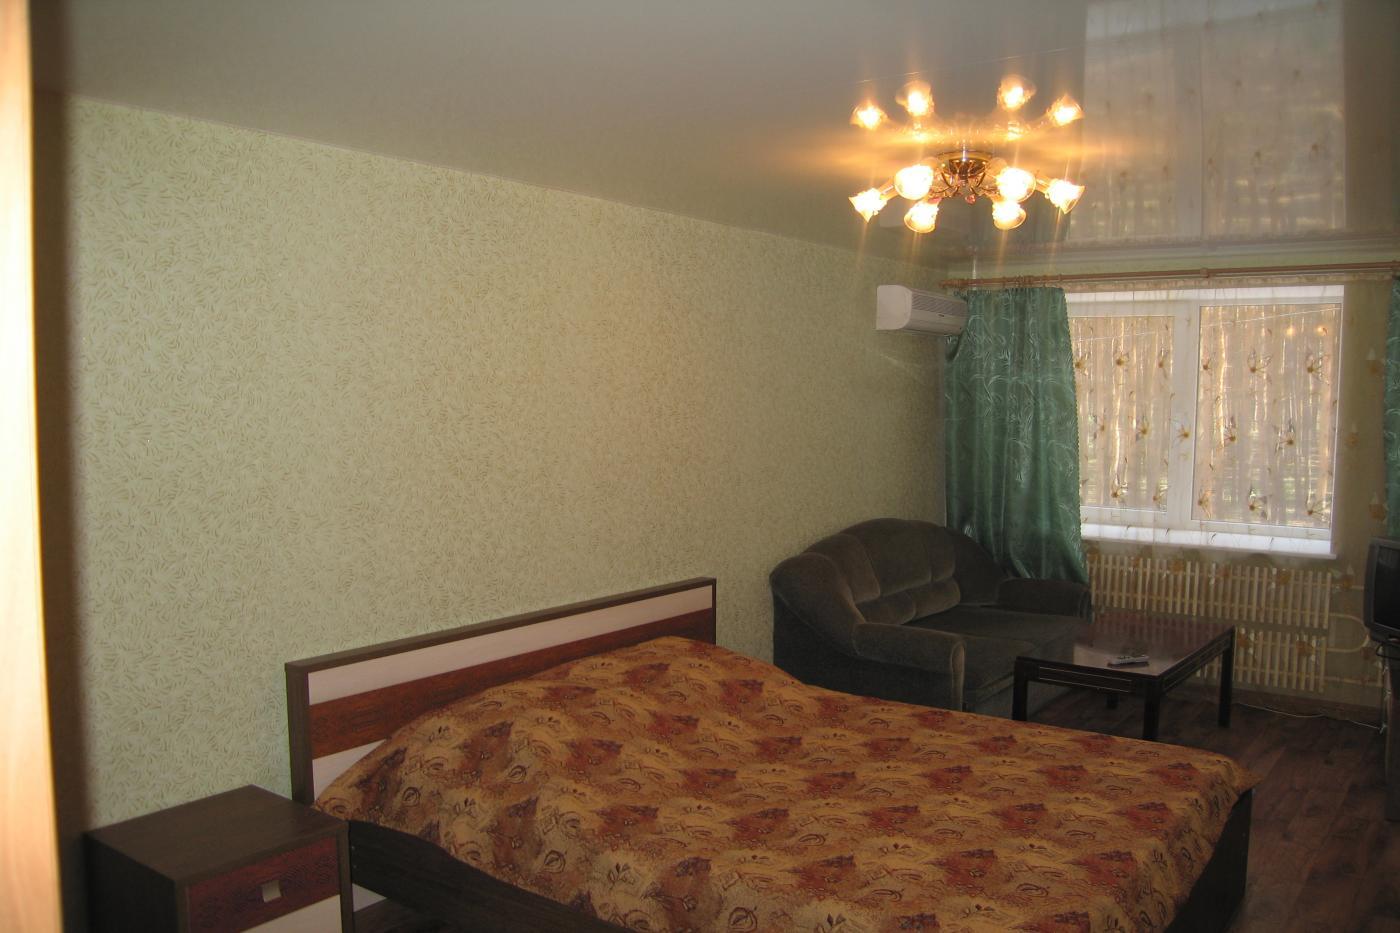 2-комнатная квартира посуточно (вариант № 2606), ул. Антонова-Овсеенко улица, фото № 4